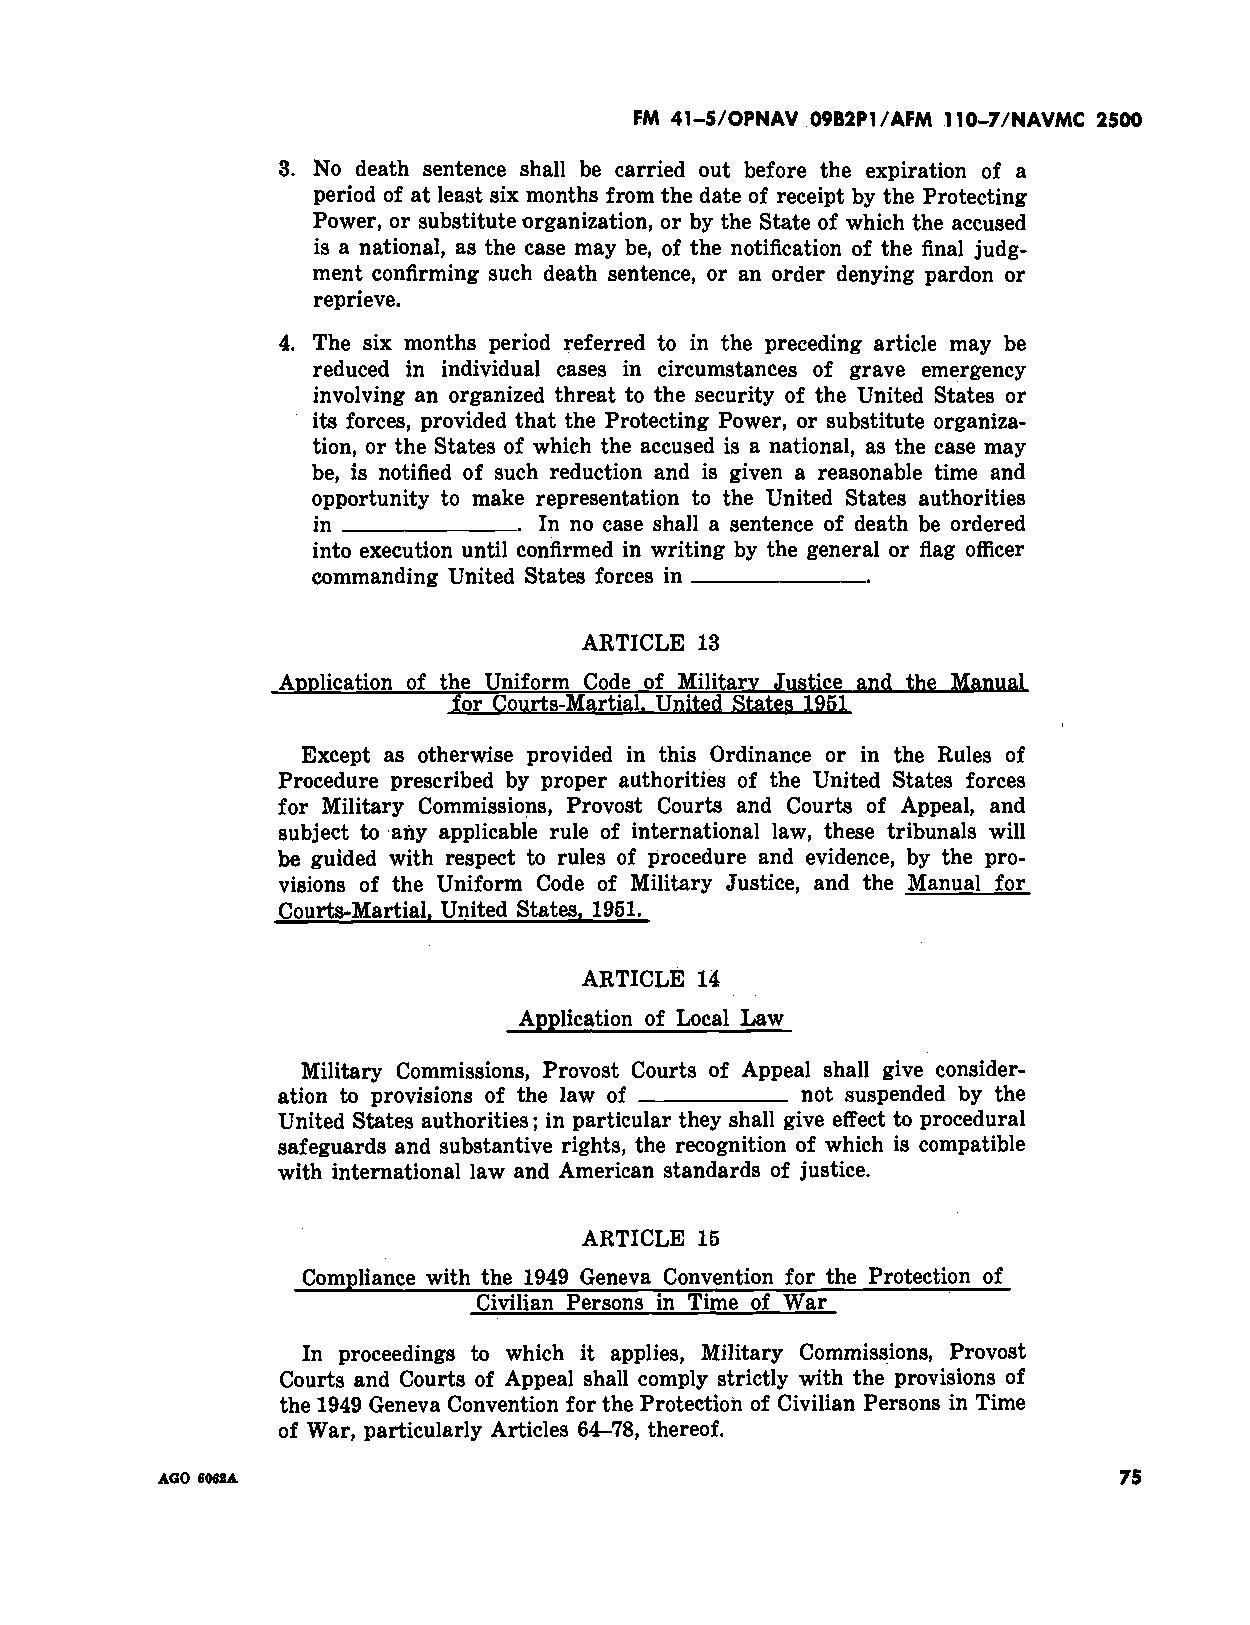 :FM 41-5 - OPNAV 09B2P1 - AFM 110-7 - NAVMC 2500 Joint Manual ...